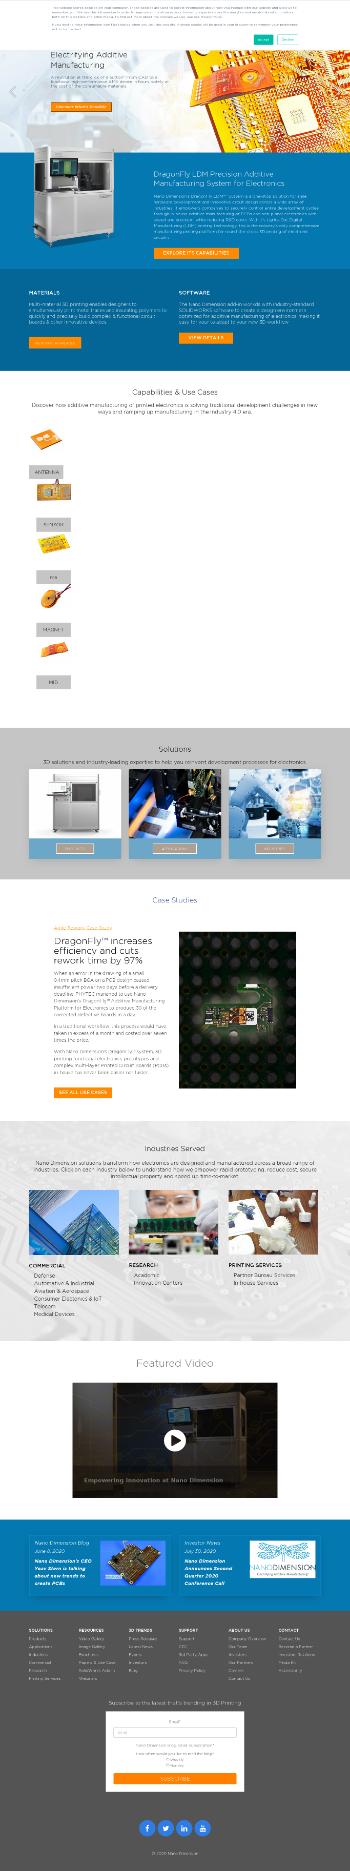 Nano Dimension Ltd. Website Screenshot